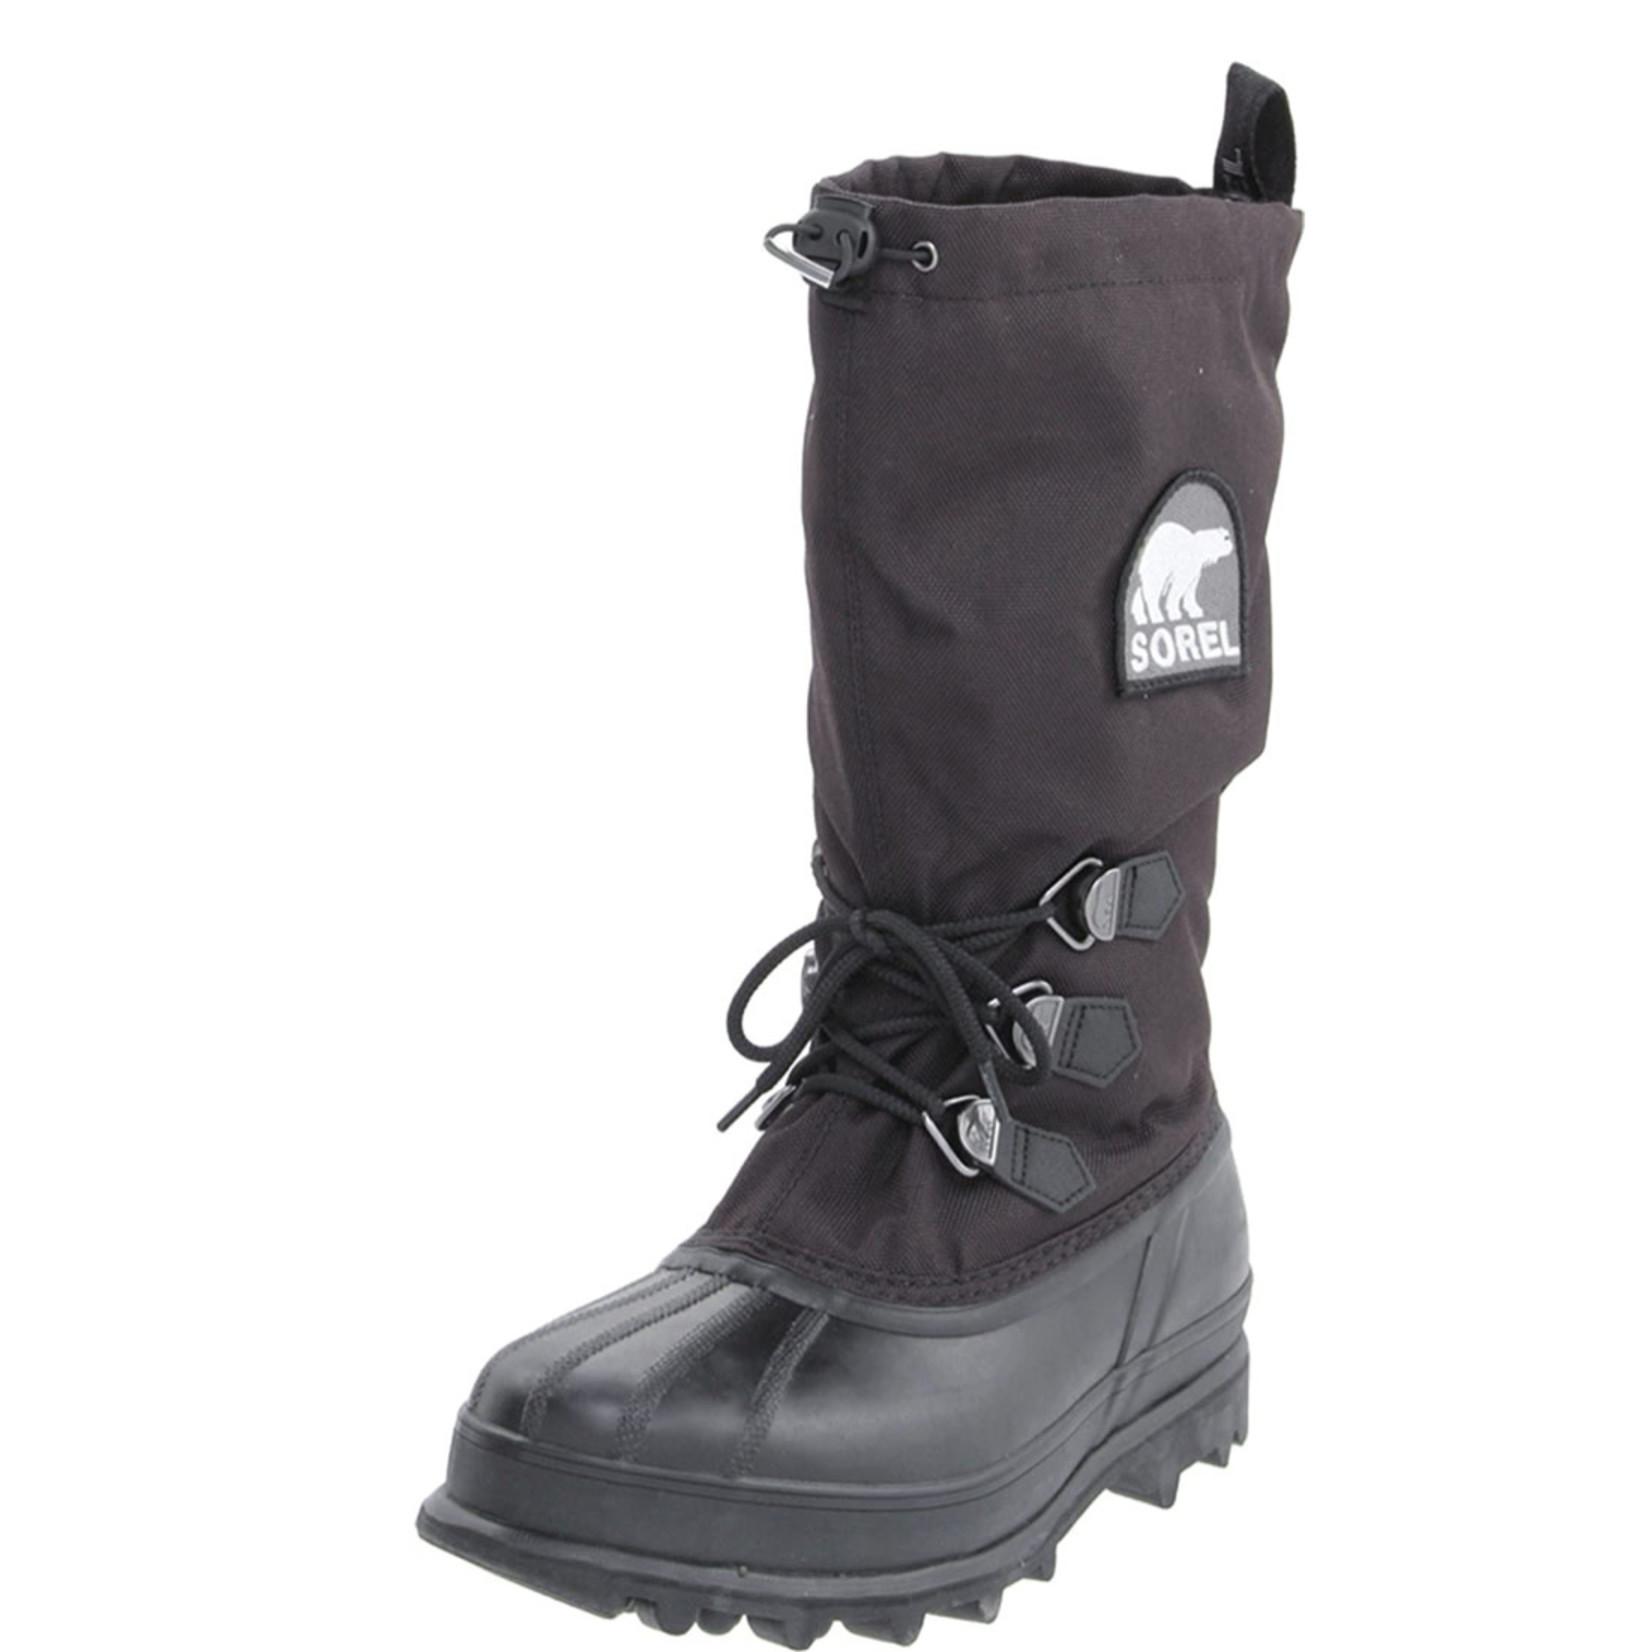 Sorel Bear Men's Winter Boot Black Rated -60